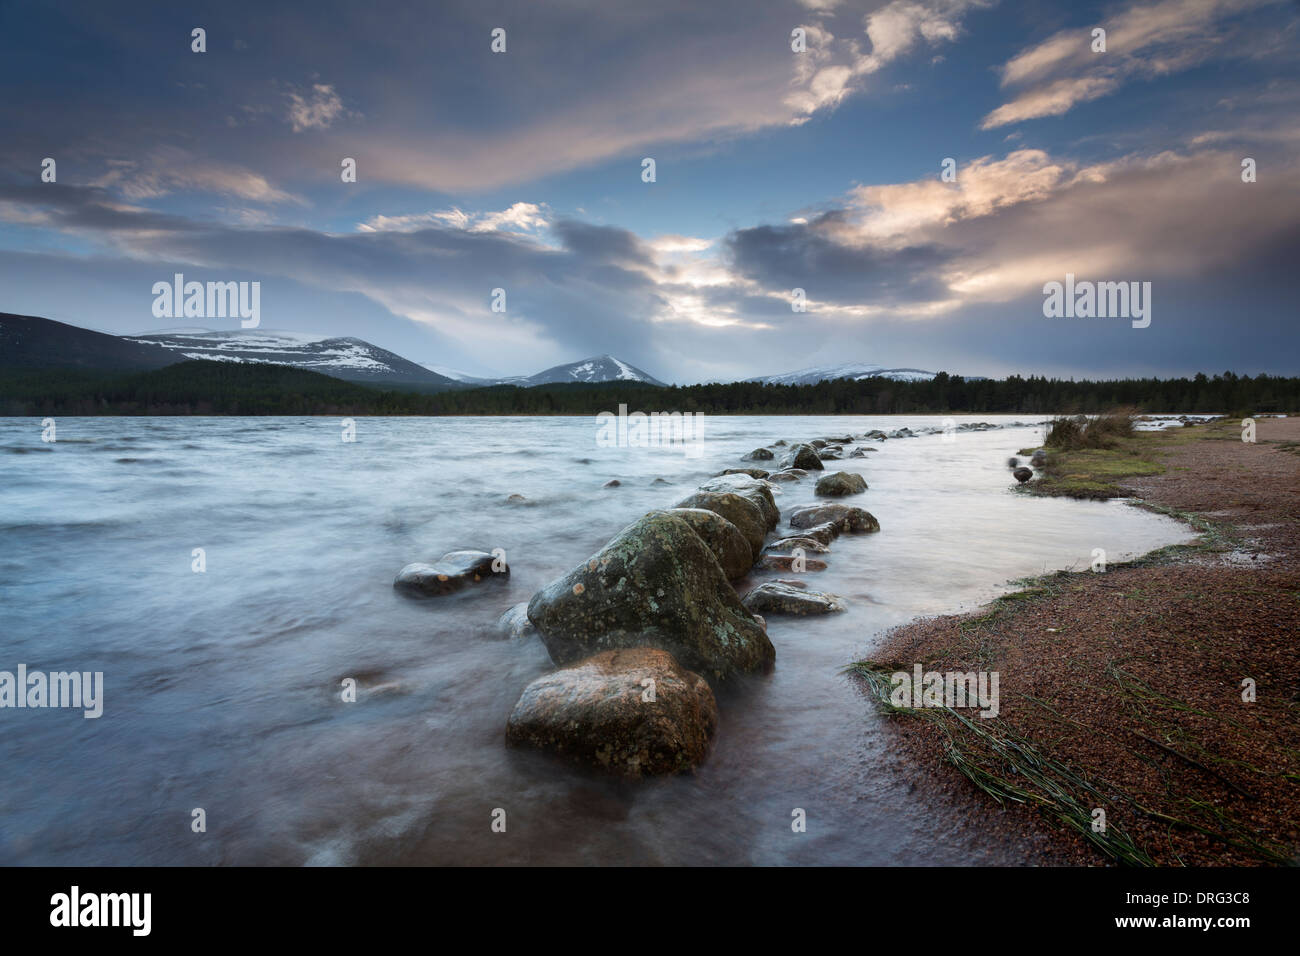 Dawn breaking over Loch Morlich in mid-winter. Stock Photo